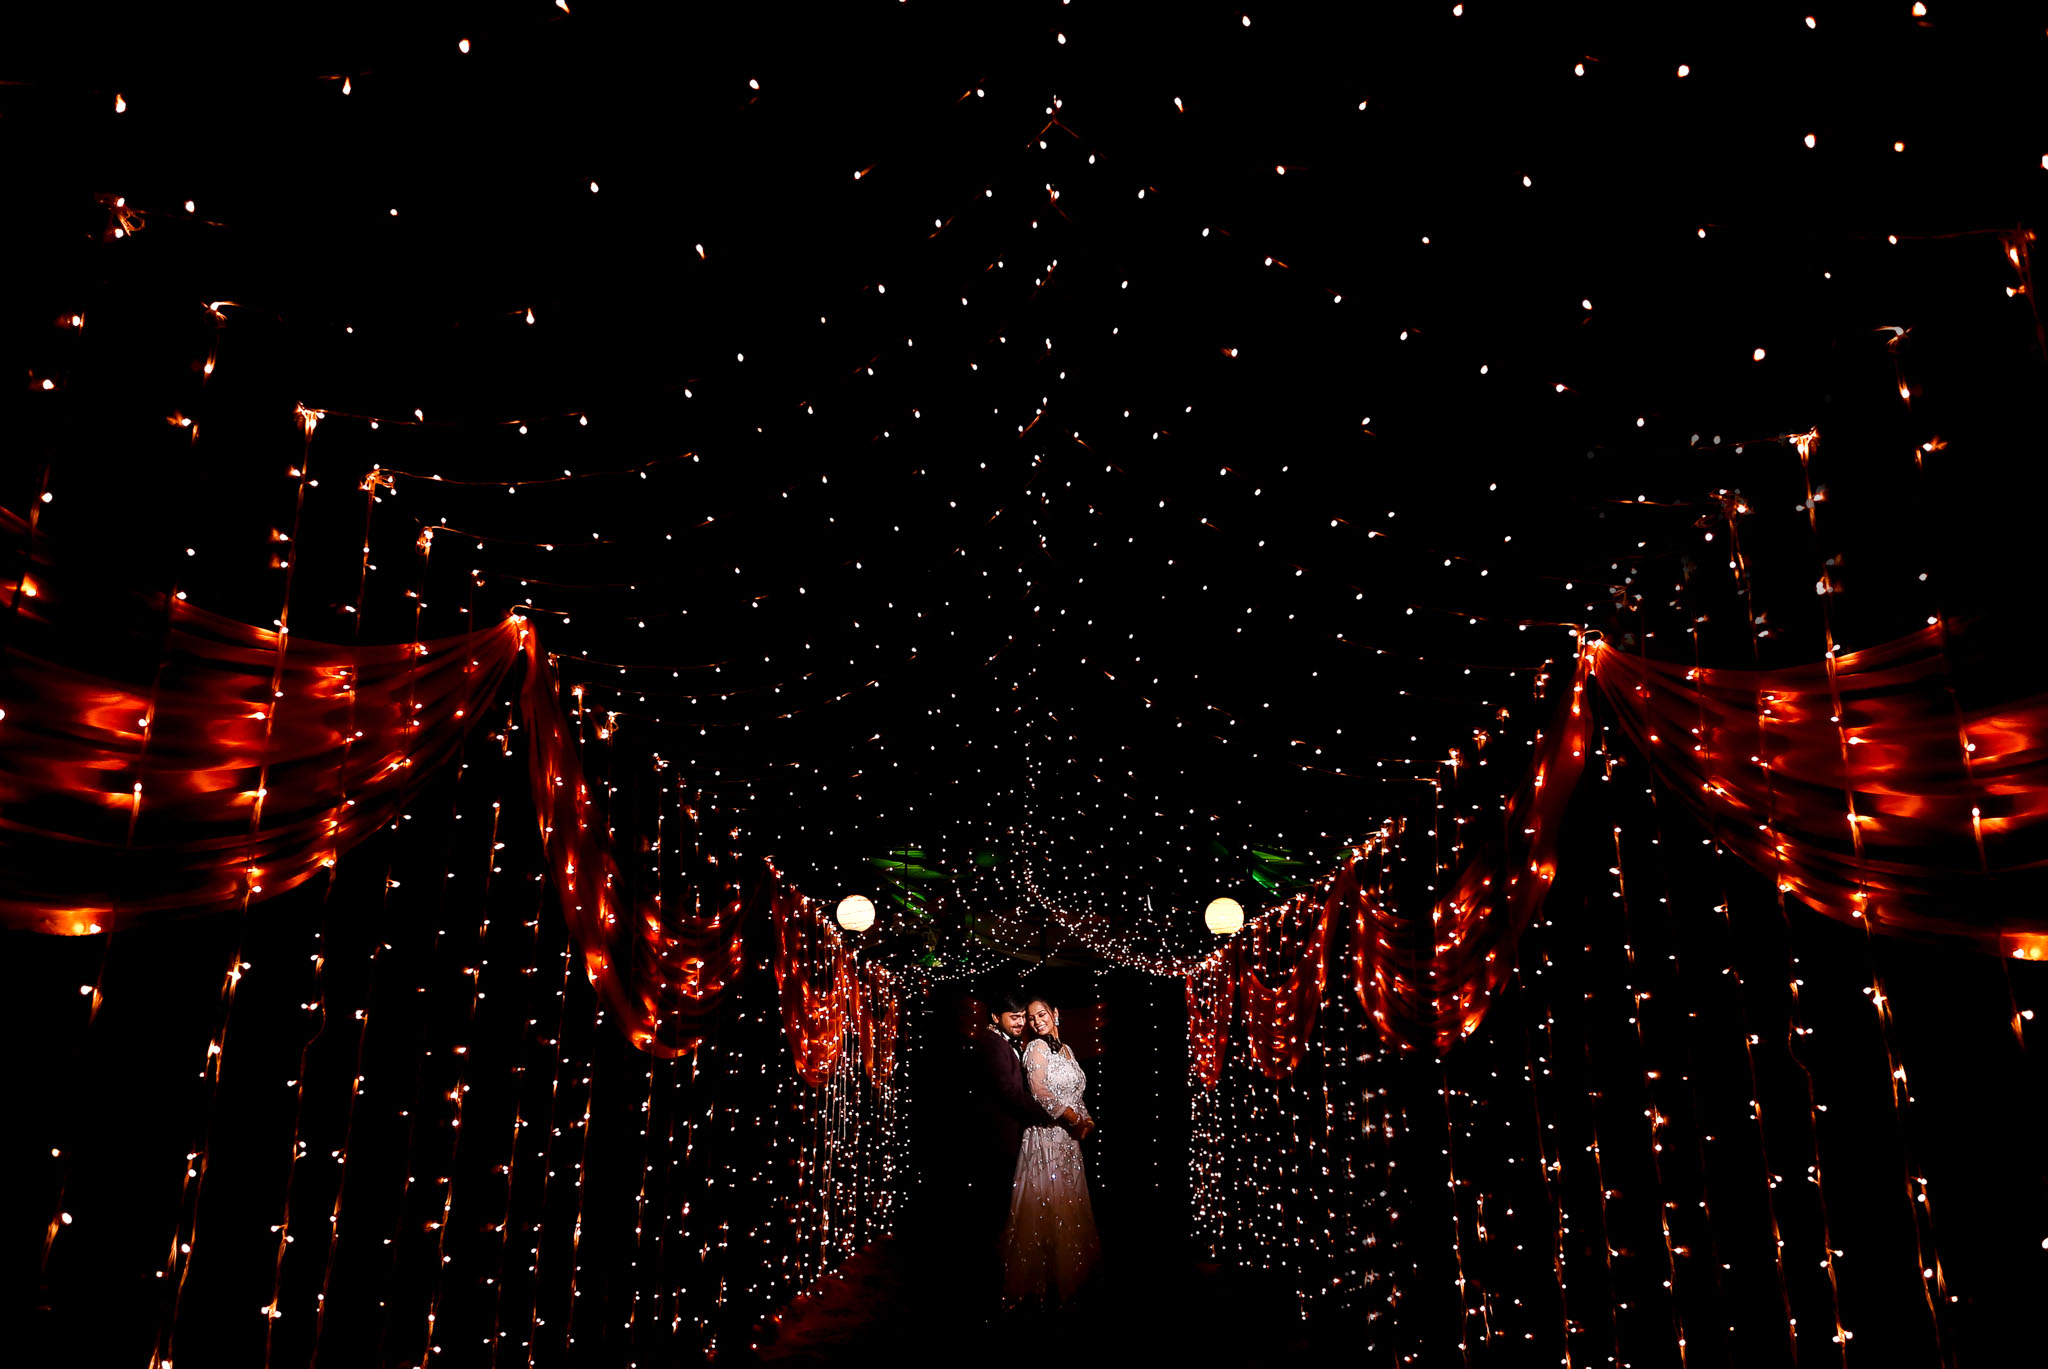 Mukti x Ojas Wedding Akshjay Sansare Photography Best wedding photographer in mumbai India Candid Cinematic Films videos-16.jpg